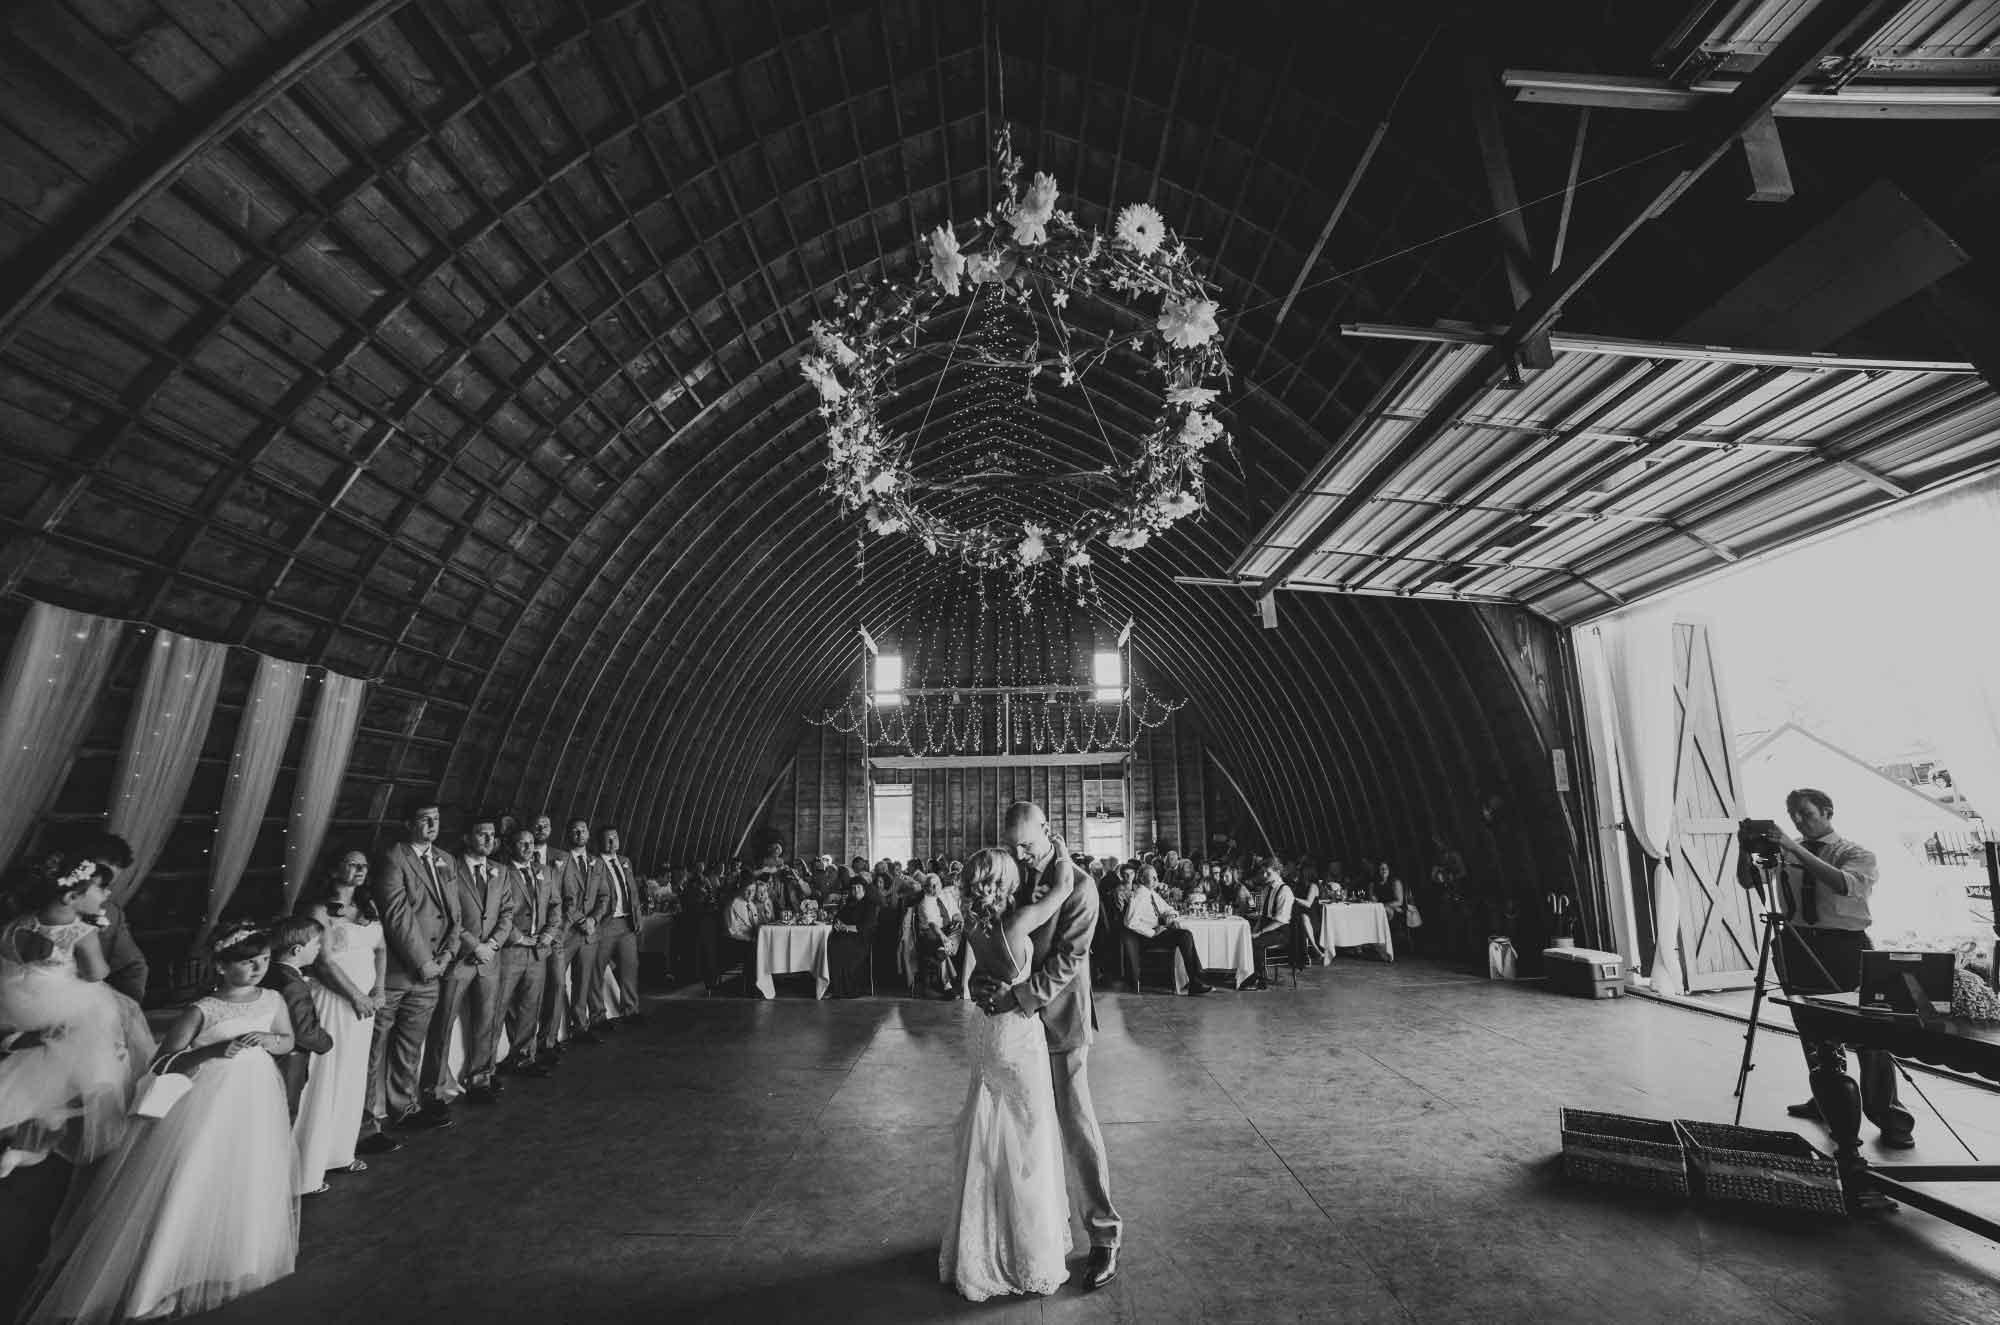 17-first-dance-barn-wedding-reception.jpg